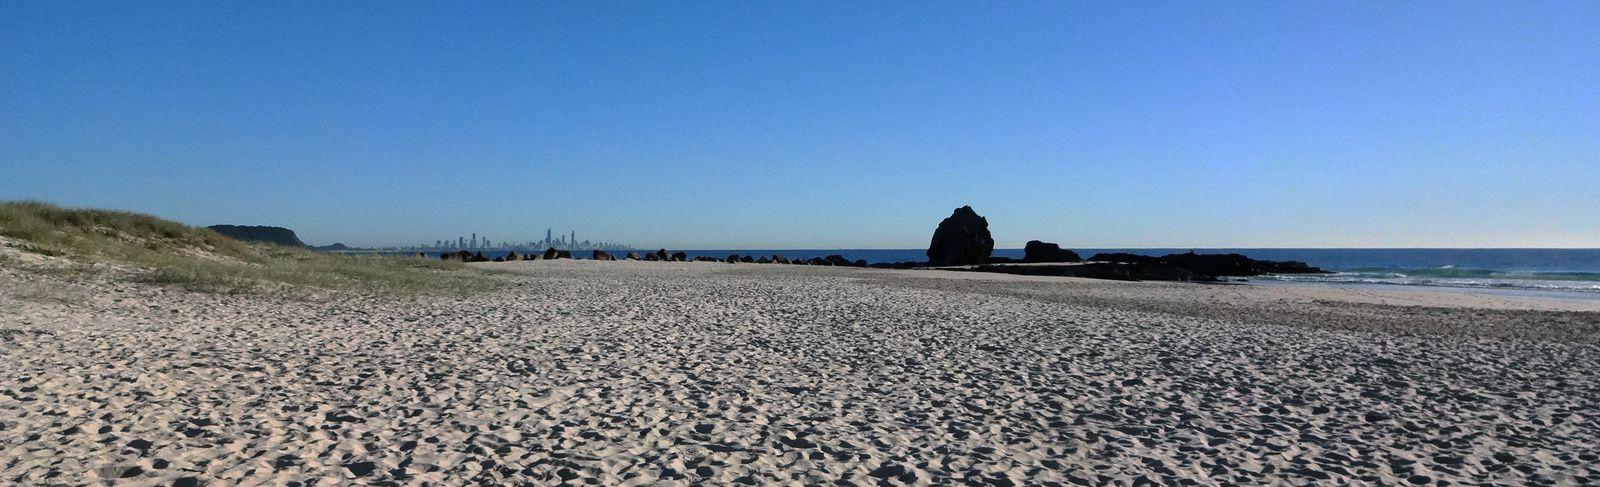 De la plage